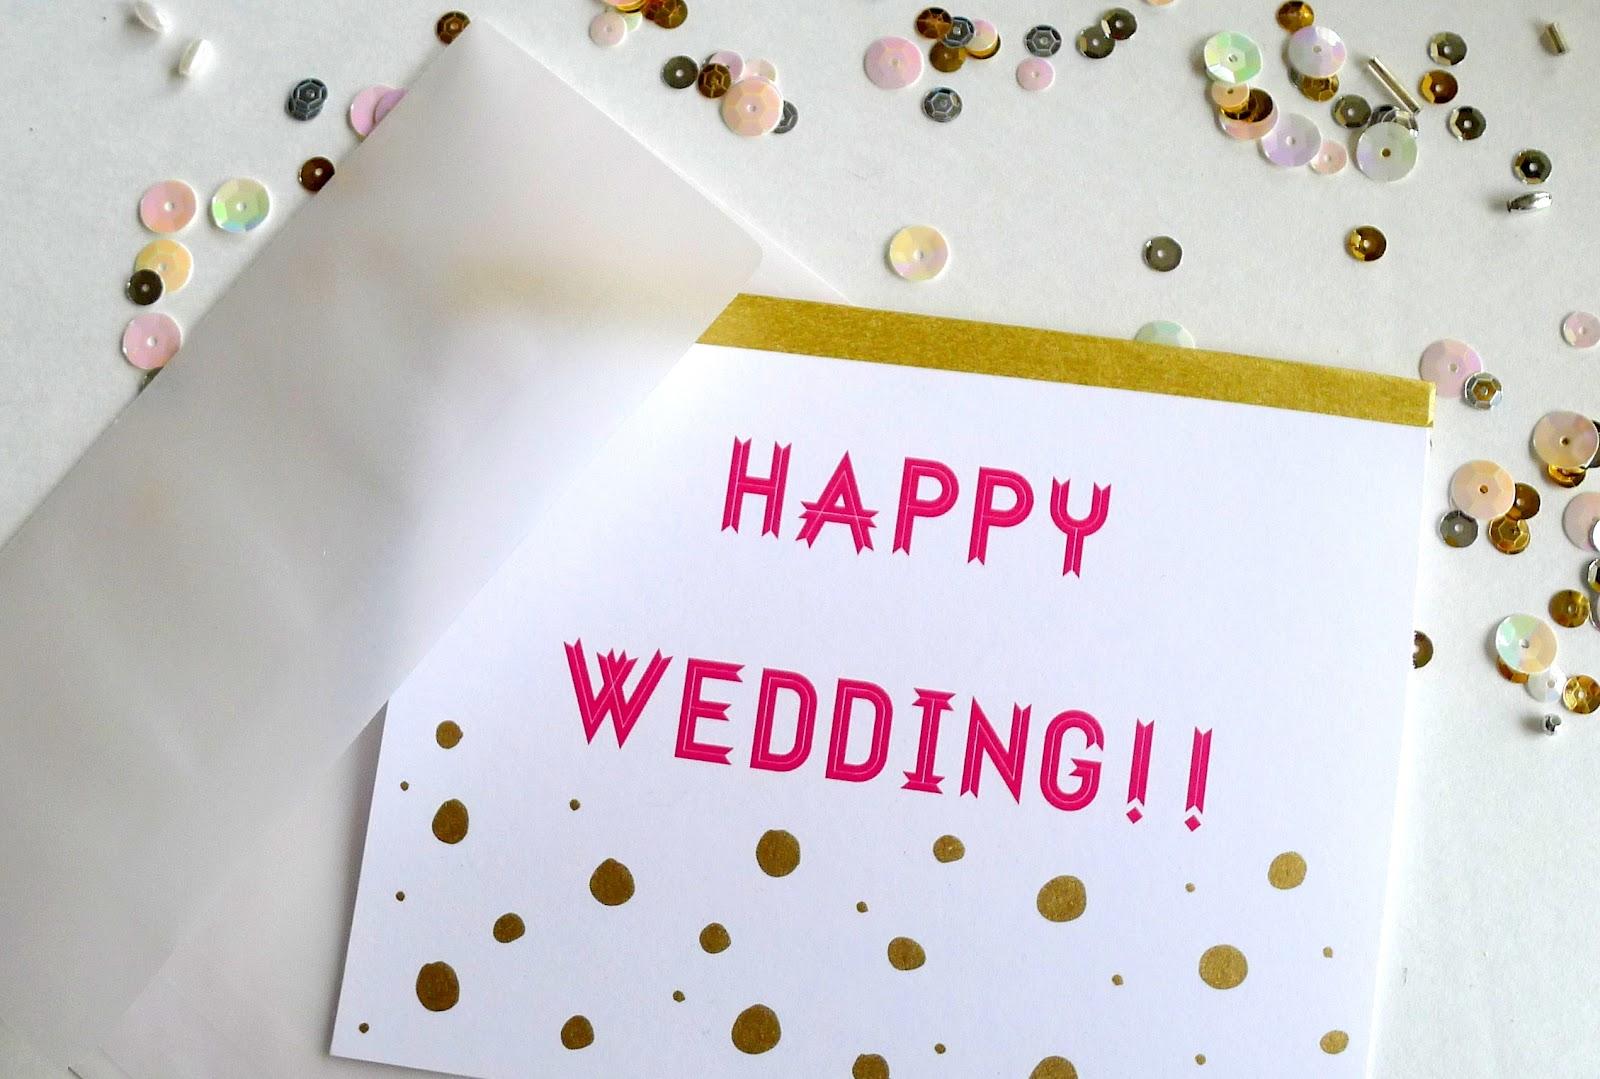 Bunny's Little Corner: Happy Wedding